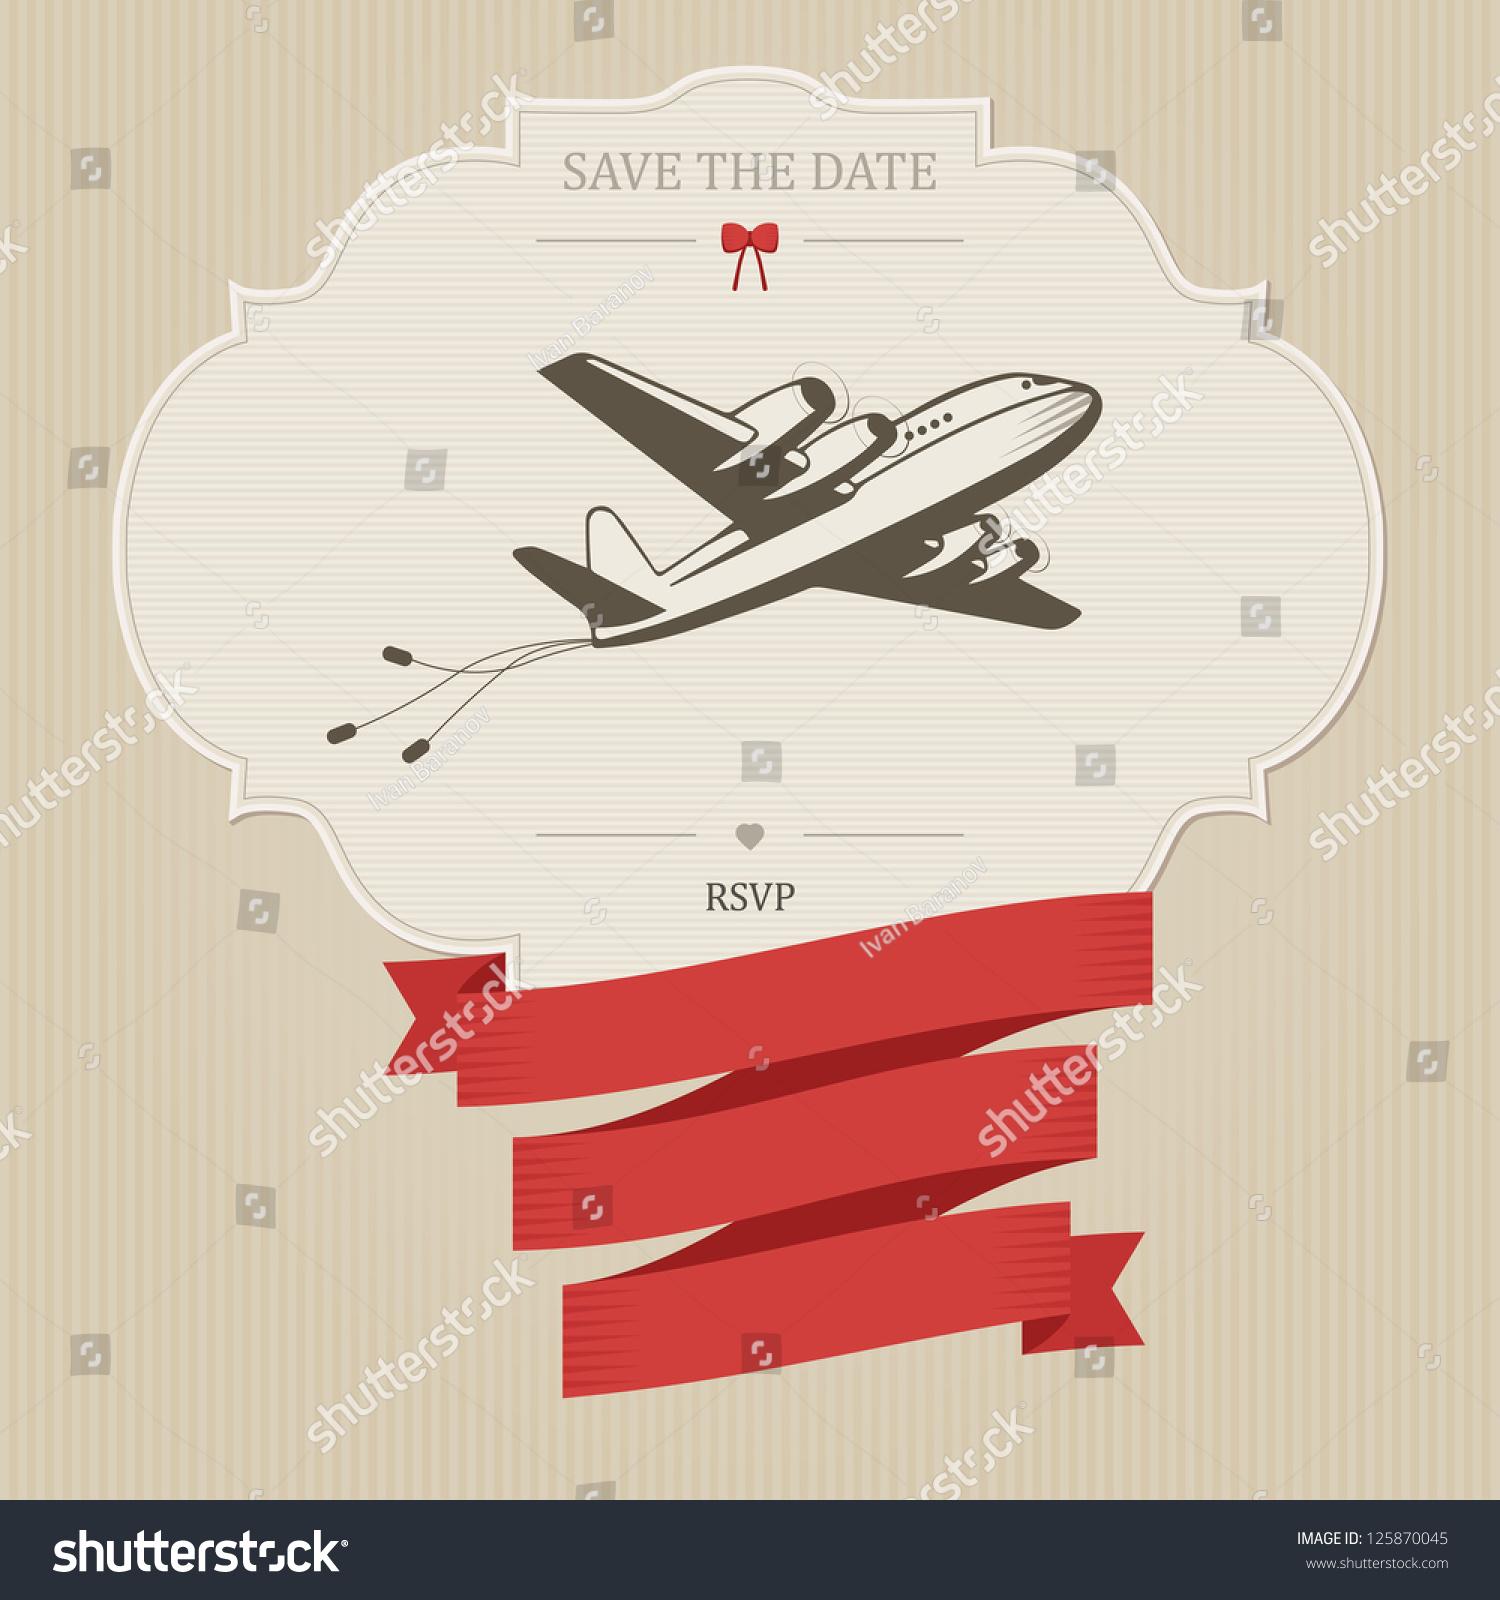 Funny Vintage Wedding Invitation Retro Aircraft Stock Illustration ...